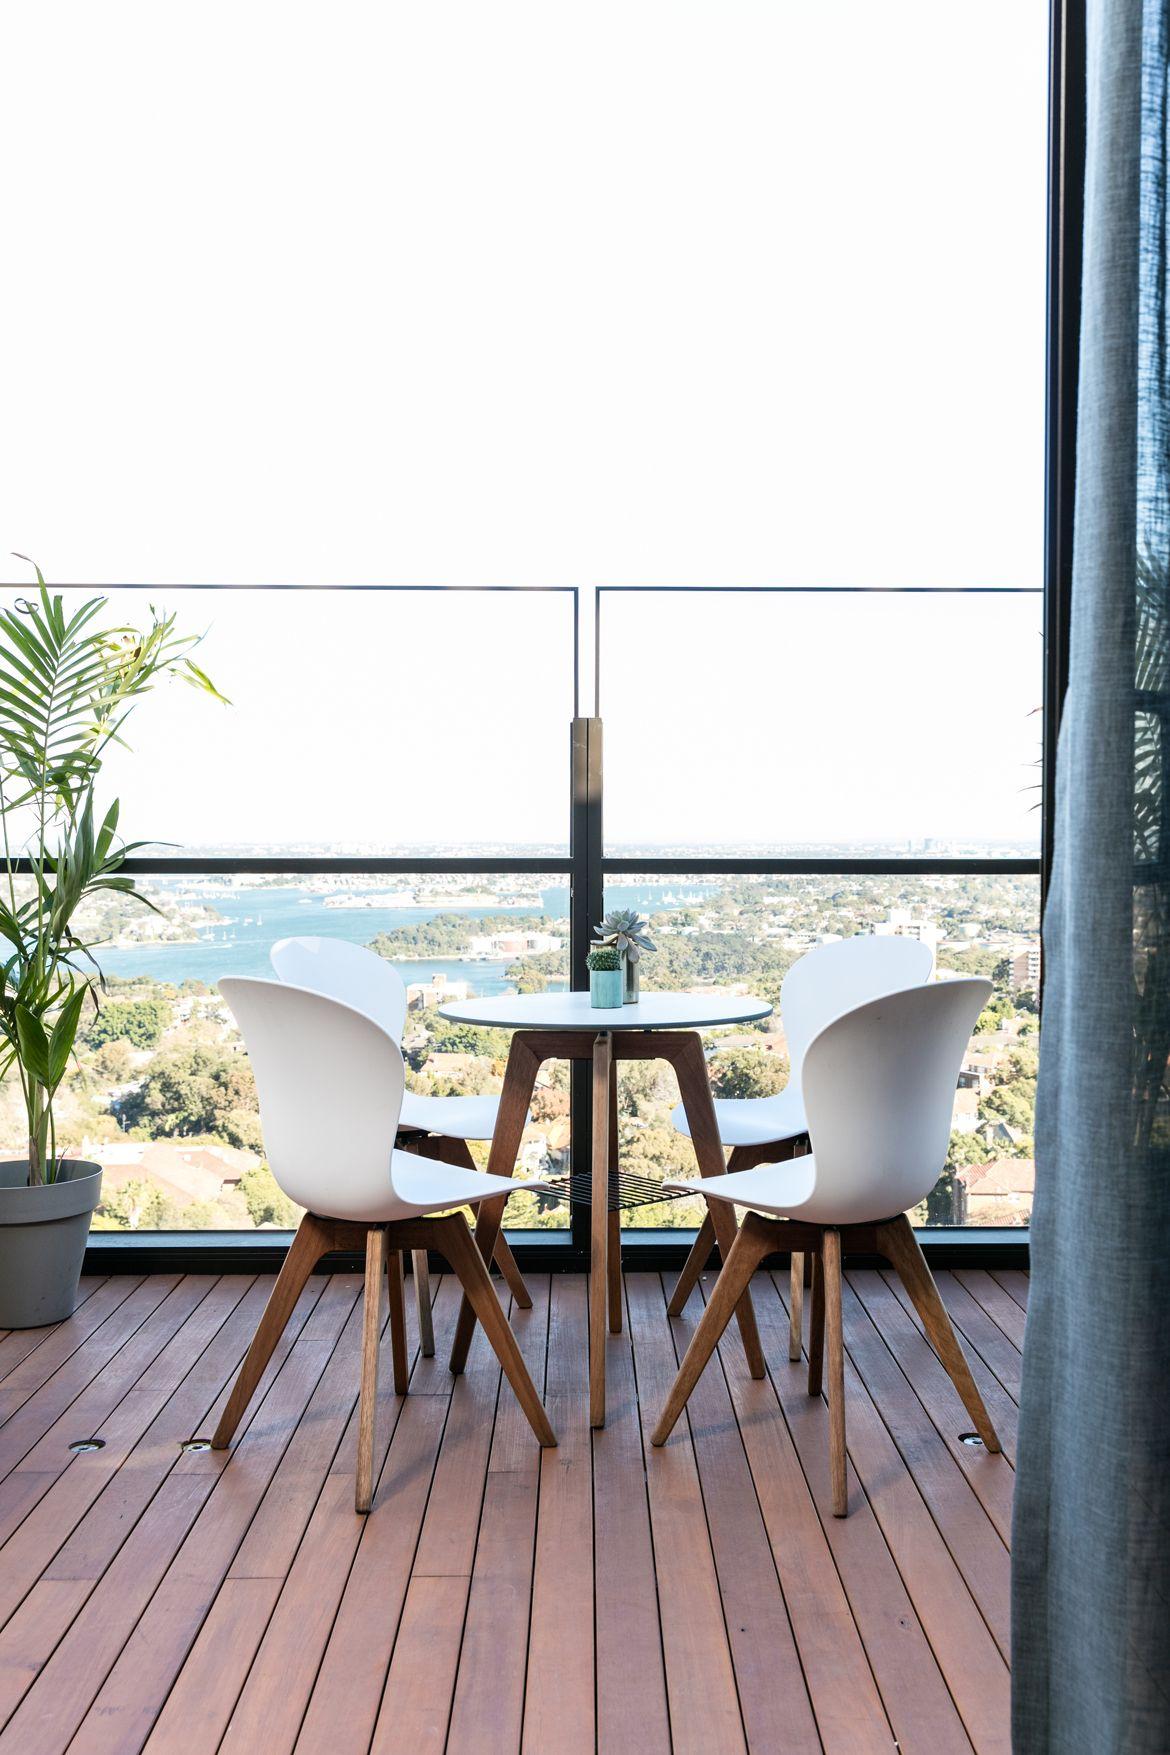 north sydney pentouse outdoor dining furniture steel pinterest